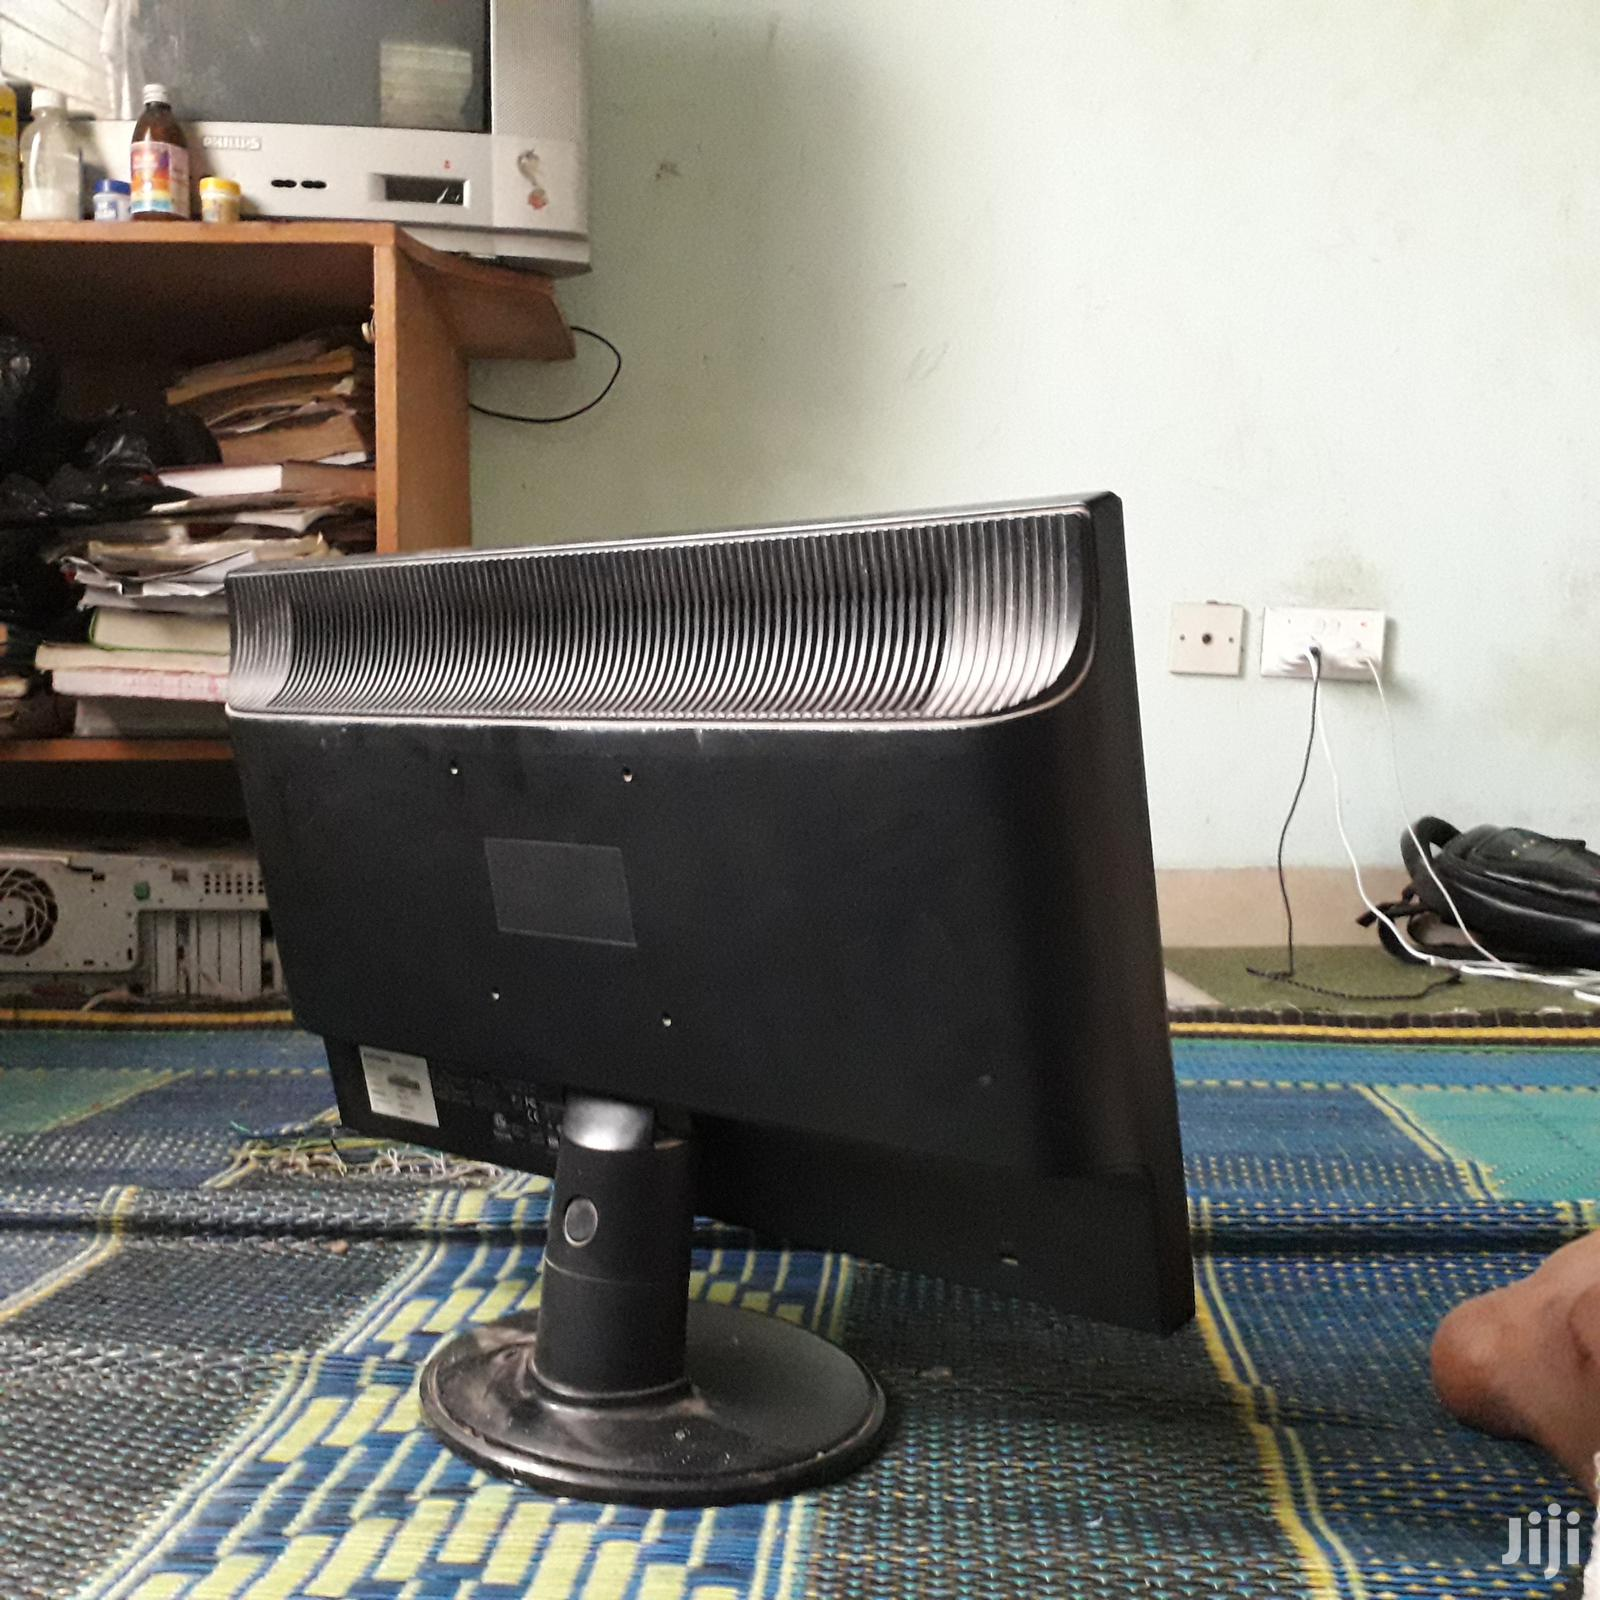 HD Wide Monitor (Compaq)   Computer Monitors for sale in Tesano, Greater Accra, Ghana